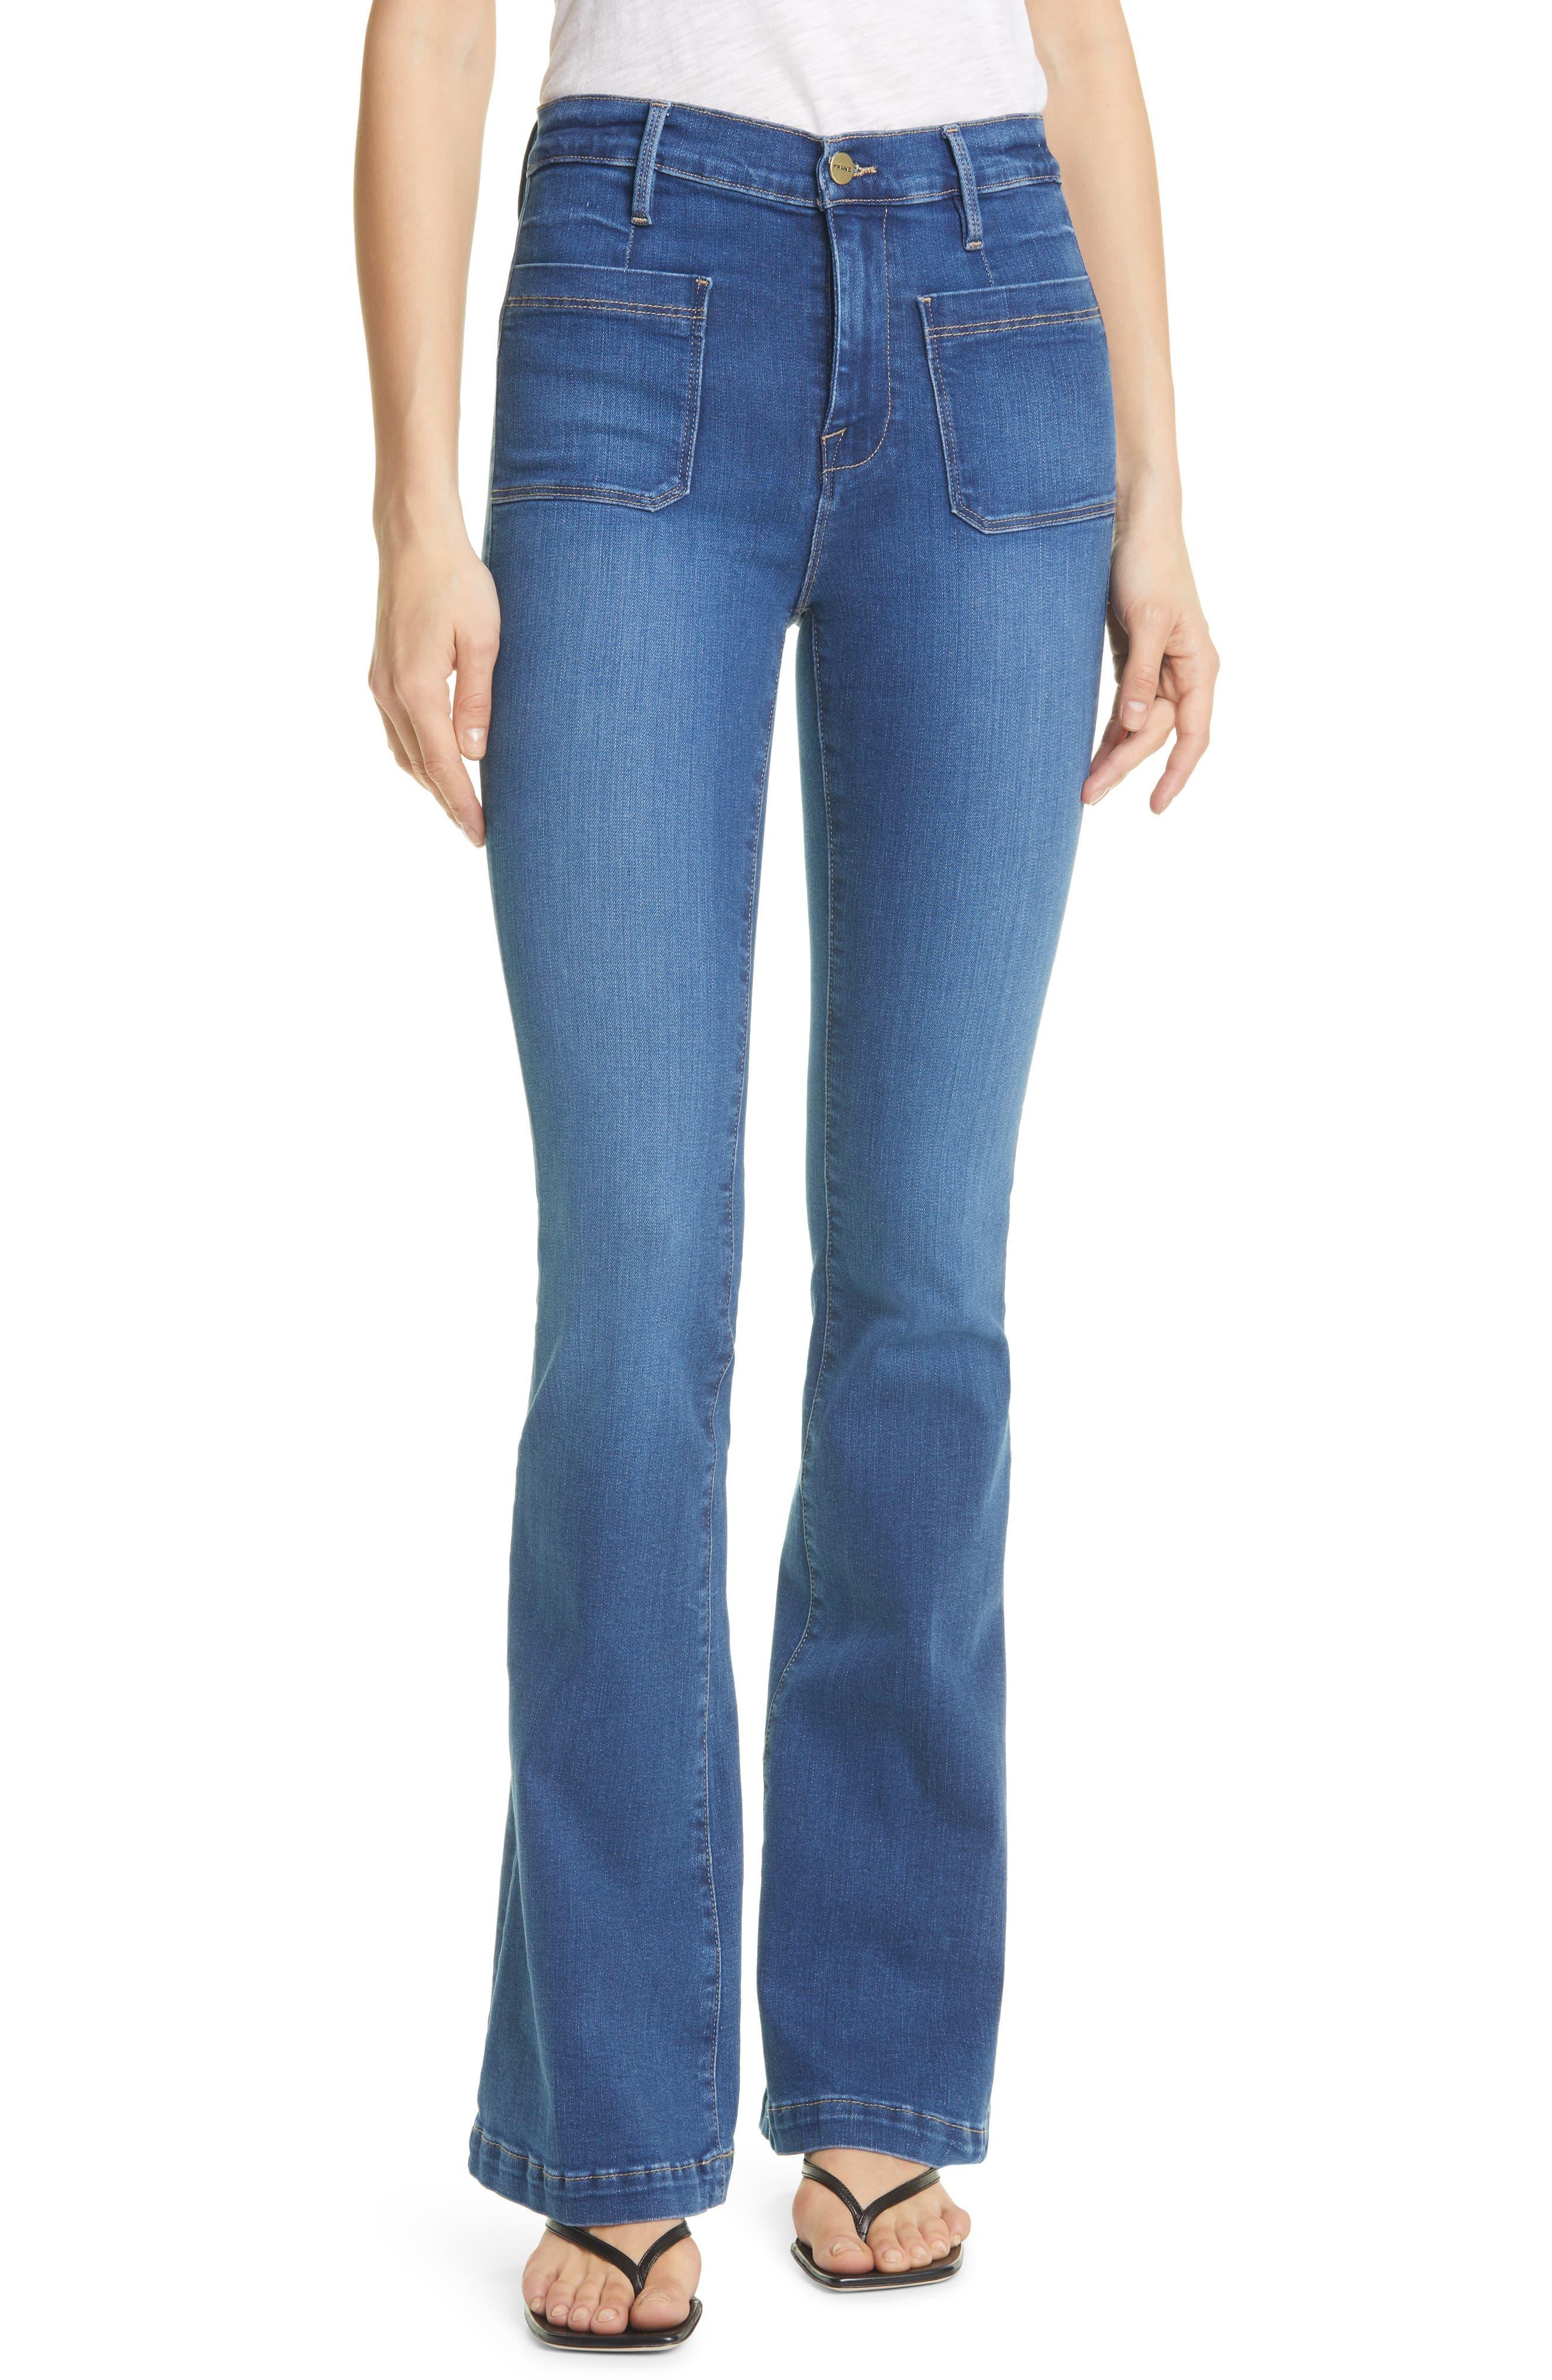 Women's Frame Le Bardot Flare Jeans